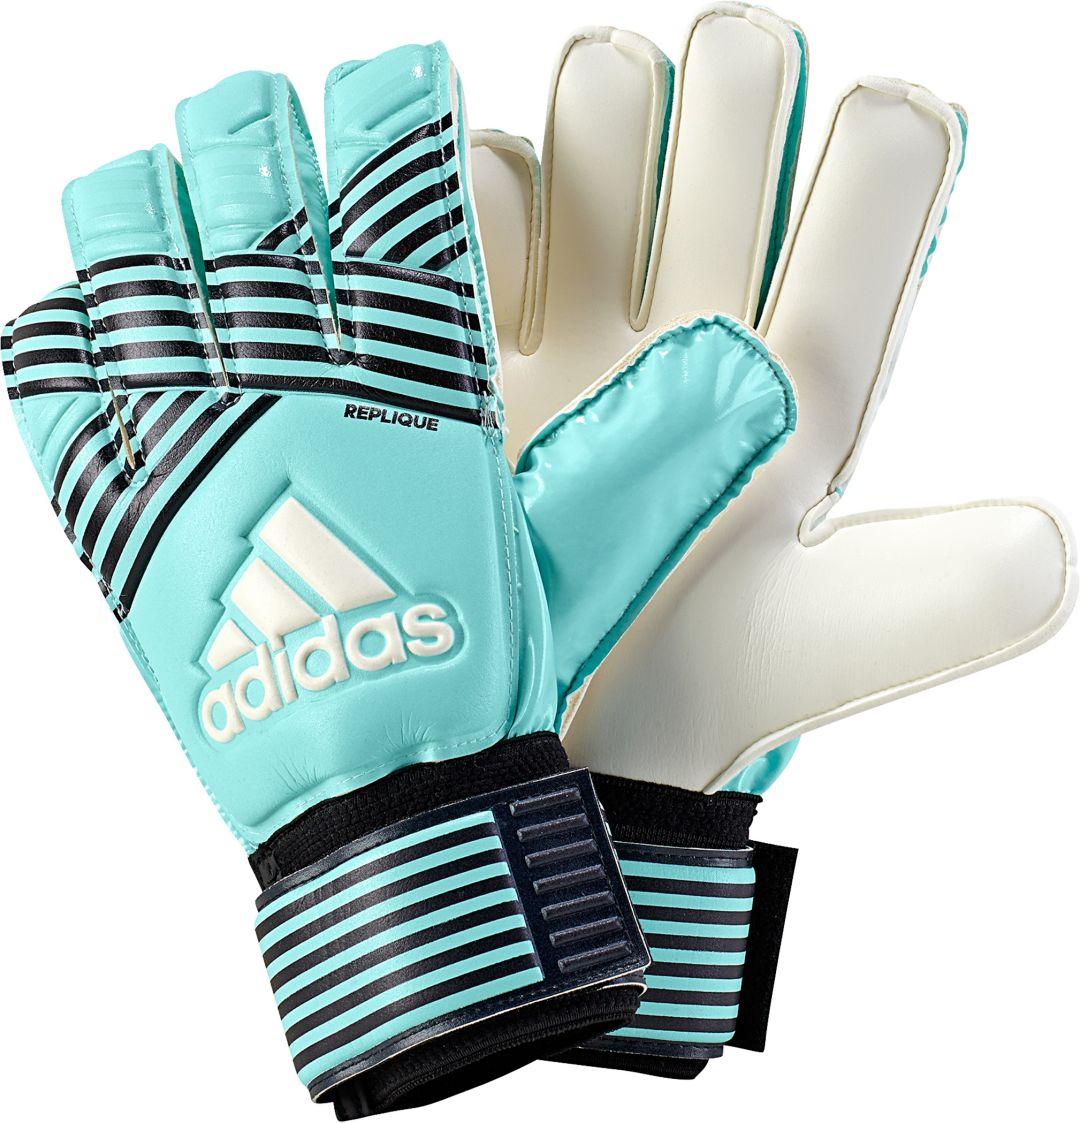 adidas Adult Ace Replique Soccer Goalkeeper Gloves